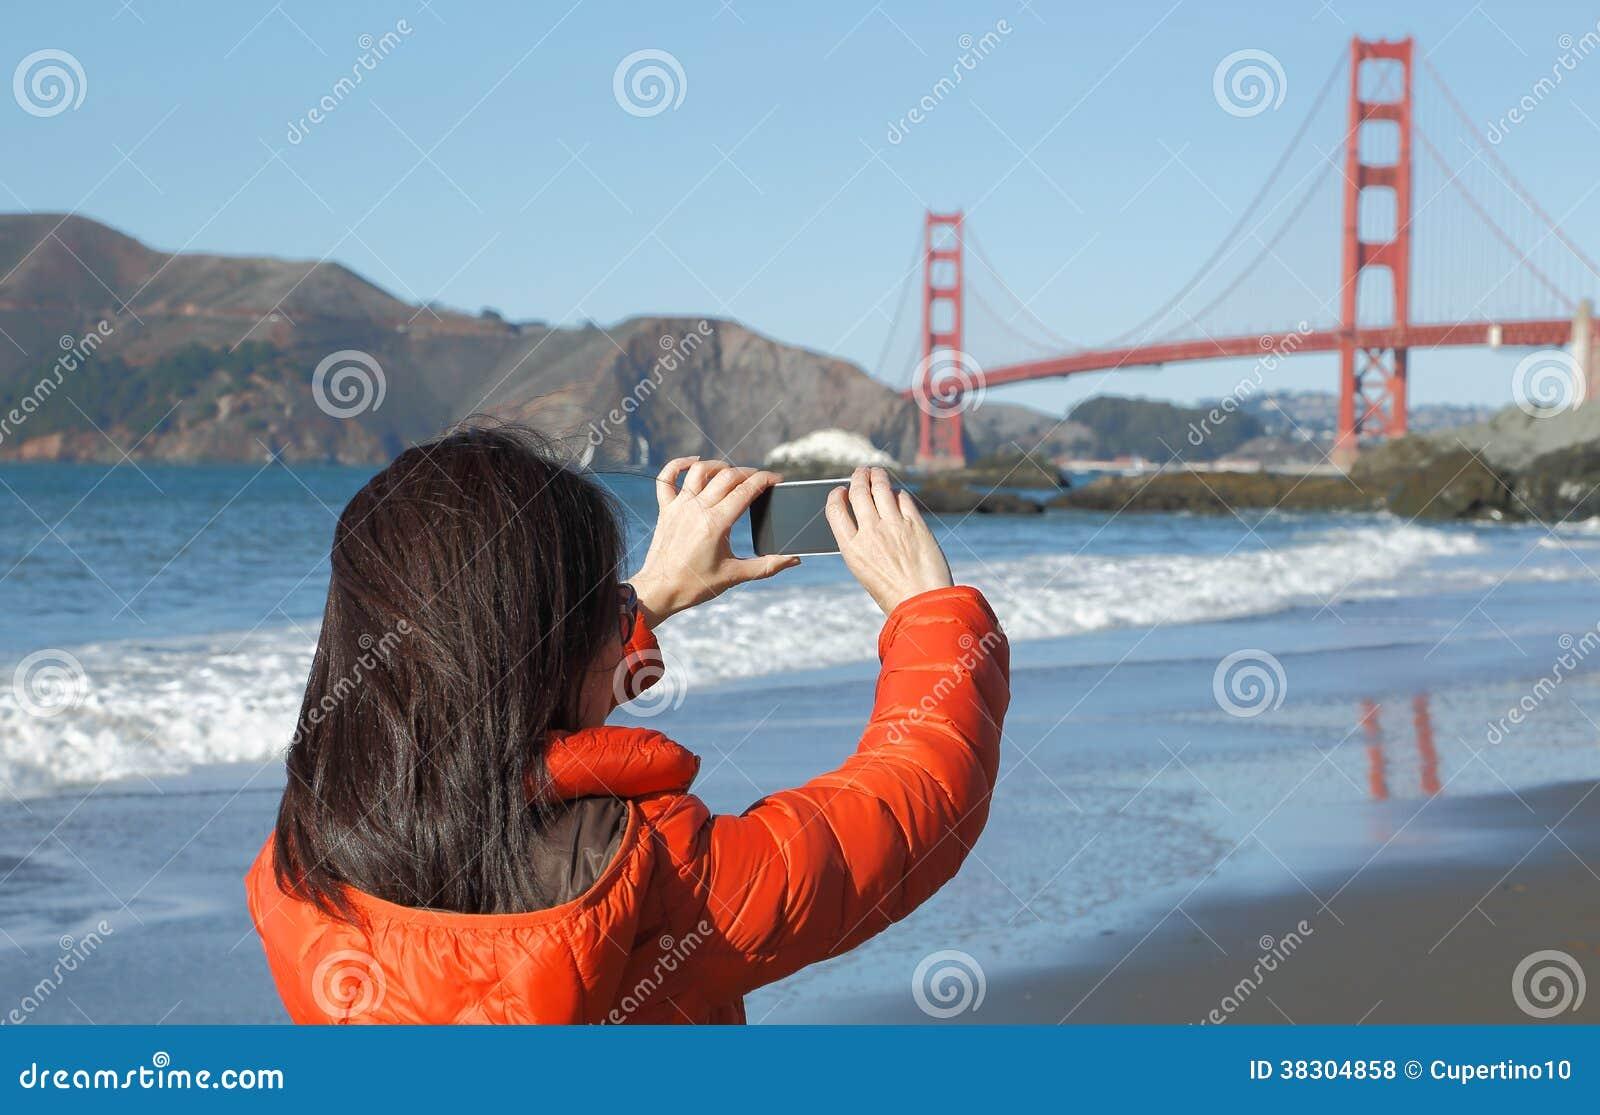 asian single women in goldens bridge 100% free online dating in goldens bridge 1,500,000 daily active members.